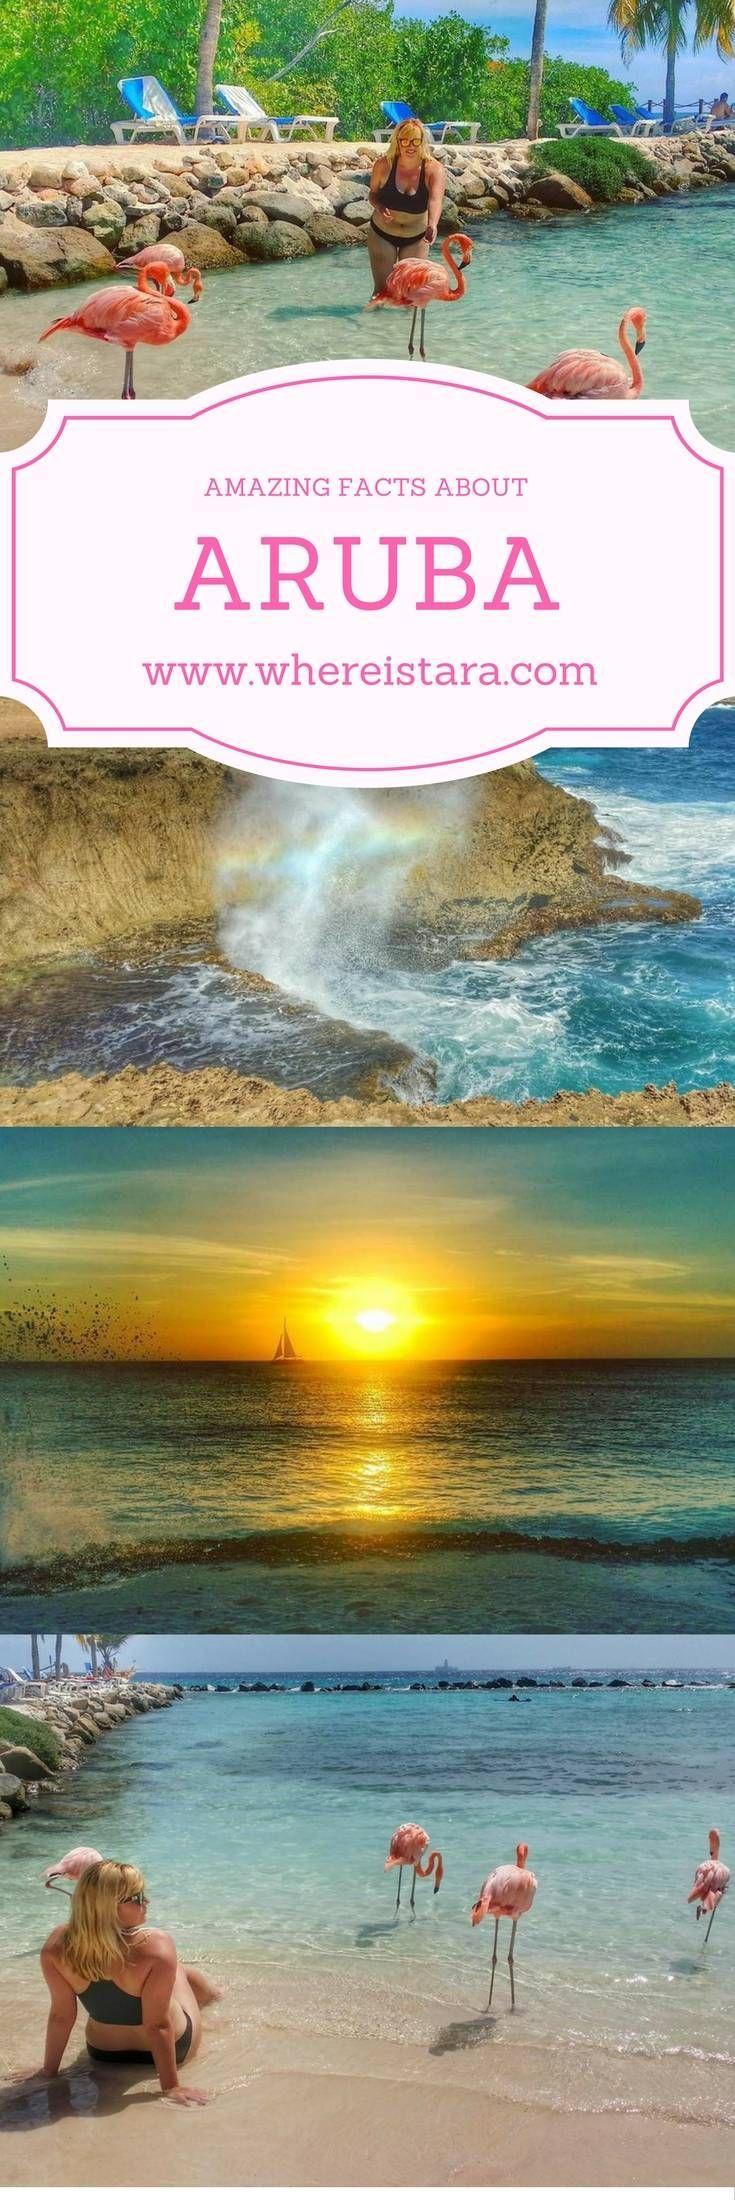 50 AMAZING FACTS ABOUT ARUBA Caribbean